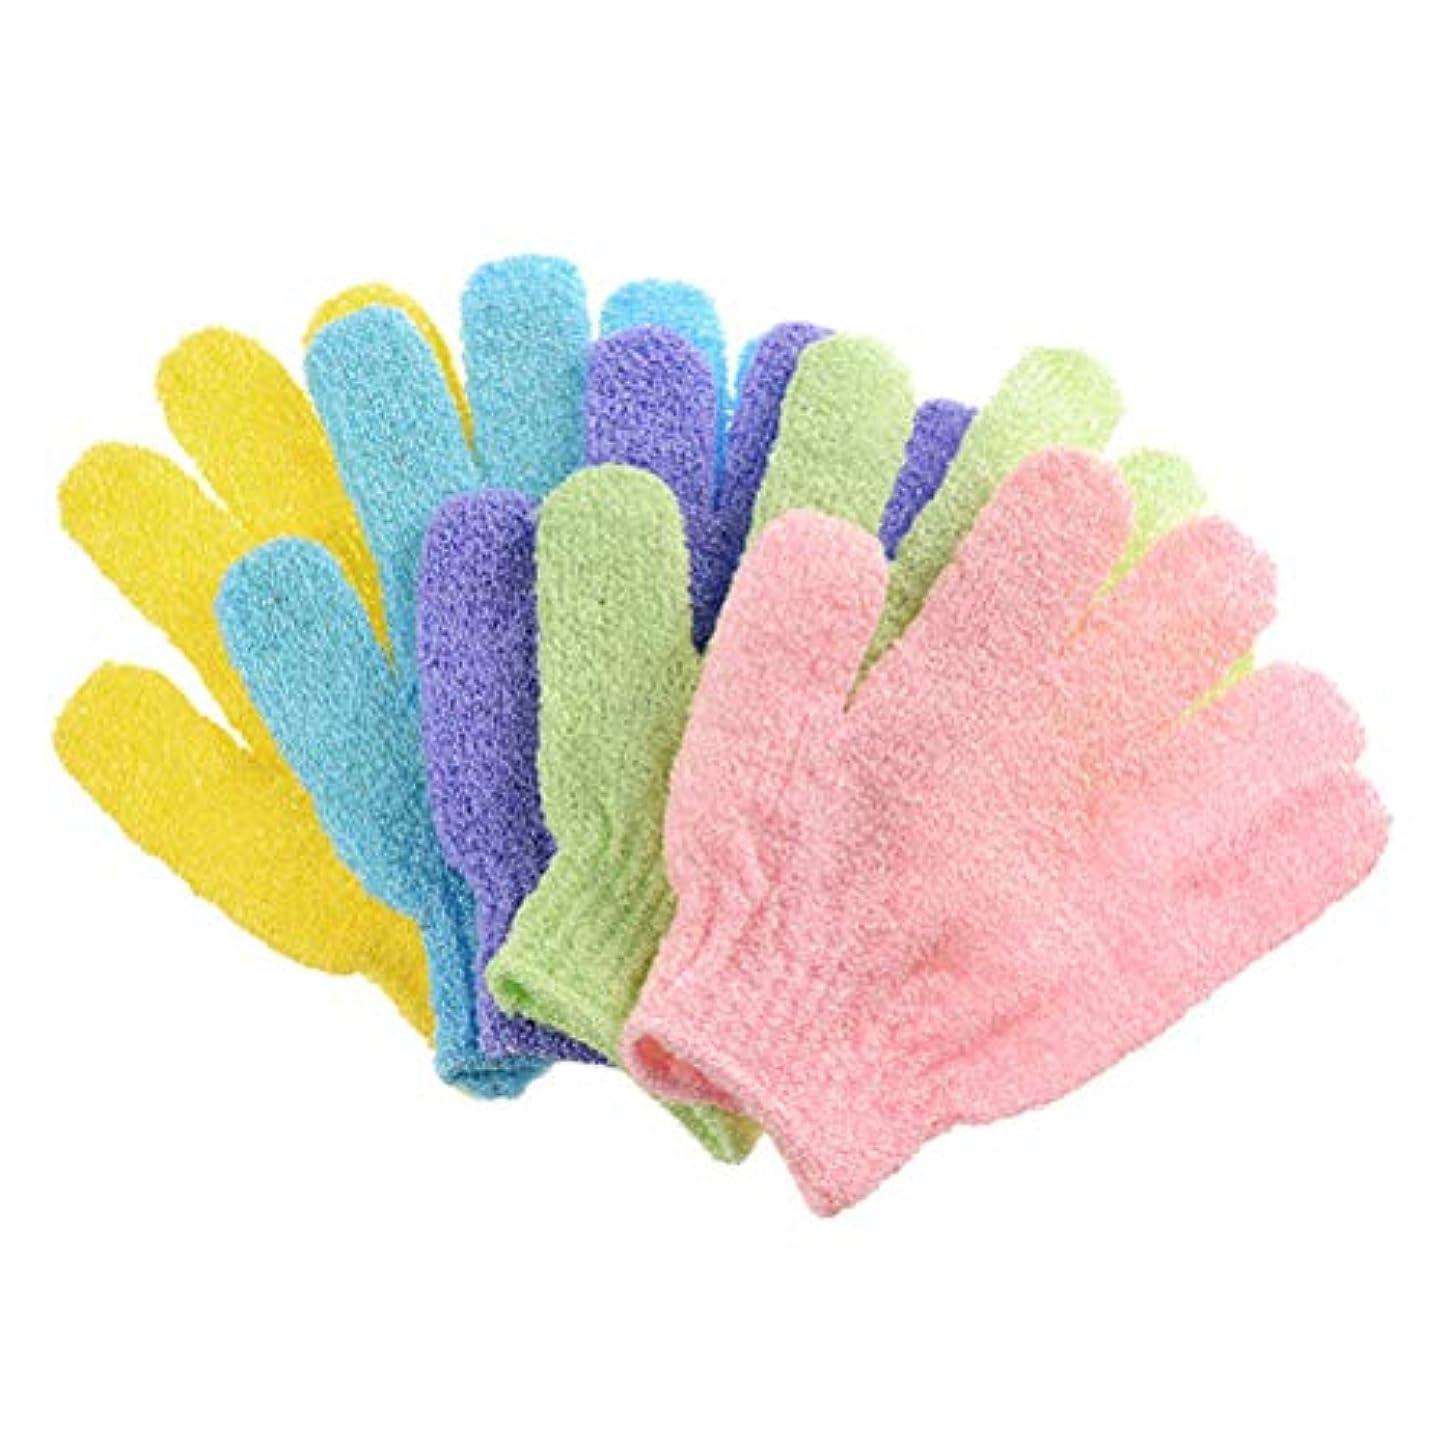 TOPBATHY 20ピースバスウォッシュタオル剥離バスクロス手袋バックスクラバーバスクロスタオルボディ用入浴用シャワースパ(混色)